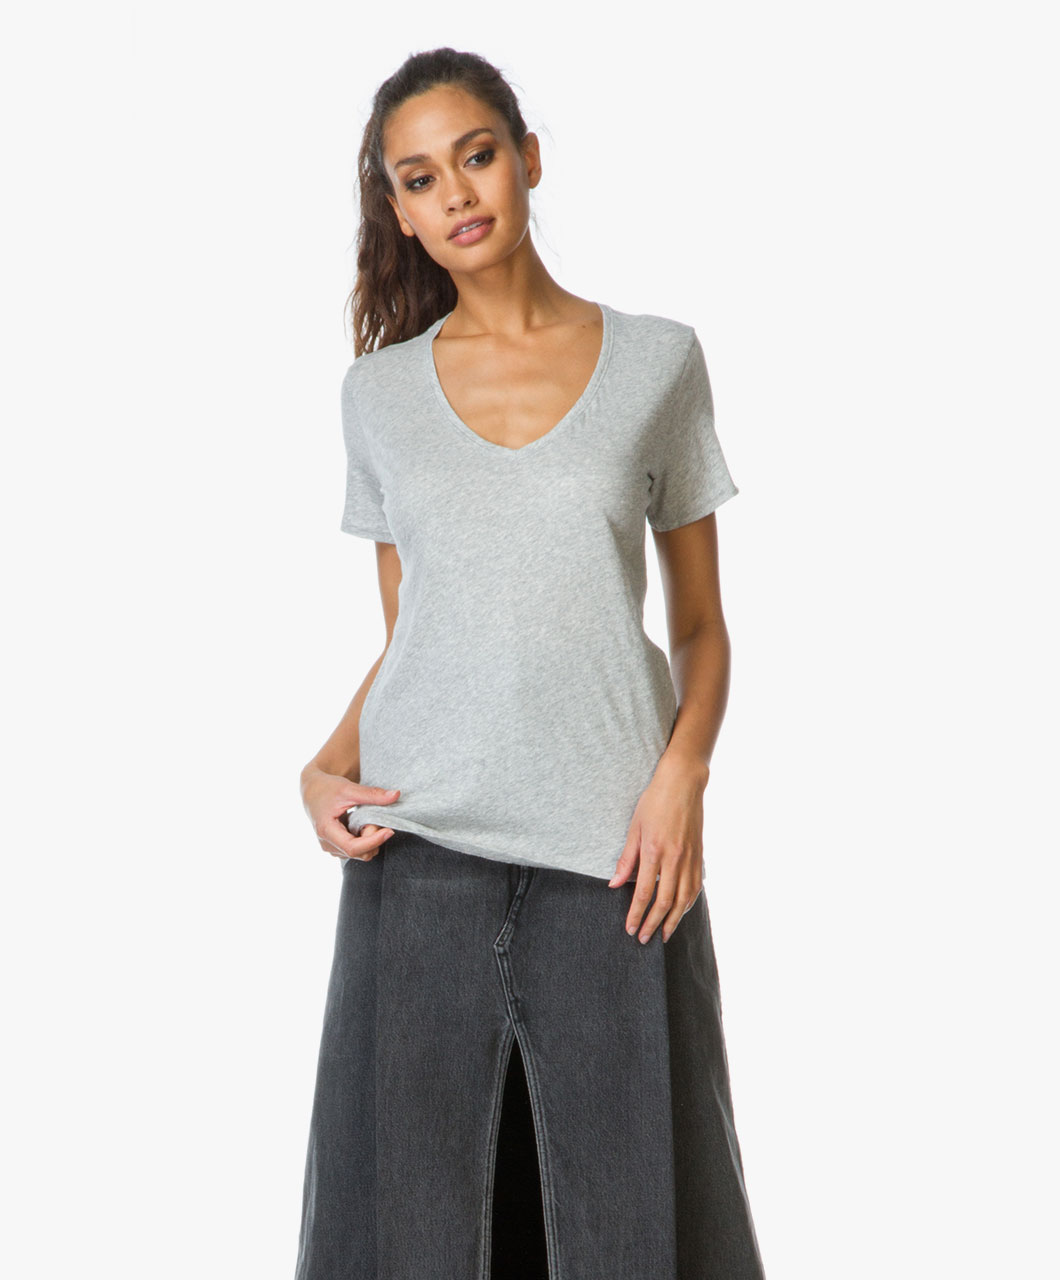 Rag bone jean base v neck t shirt heather grey for Rag and bone t shirts